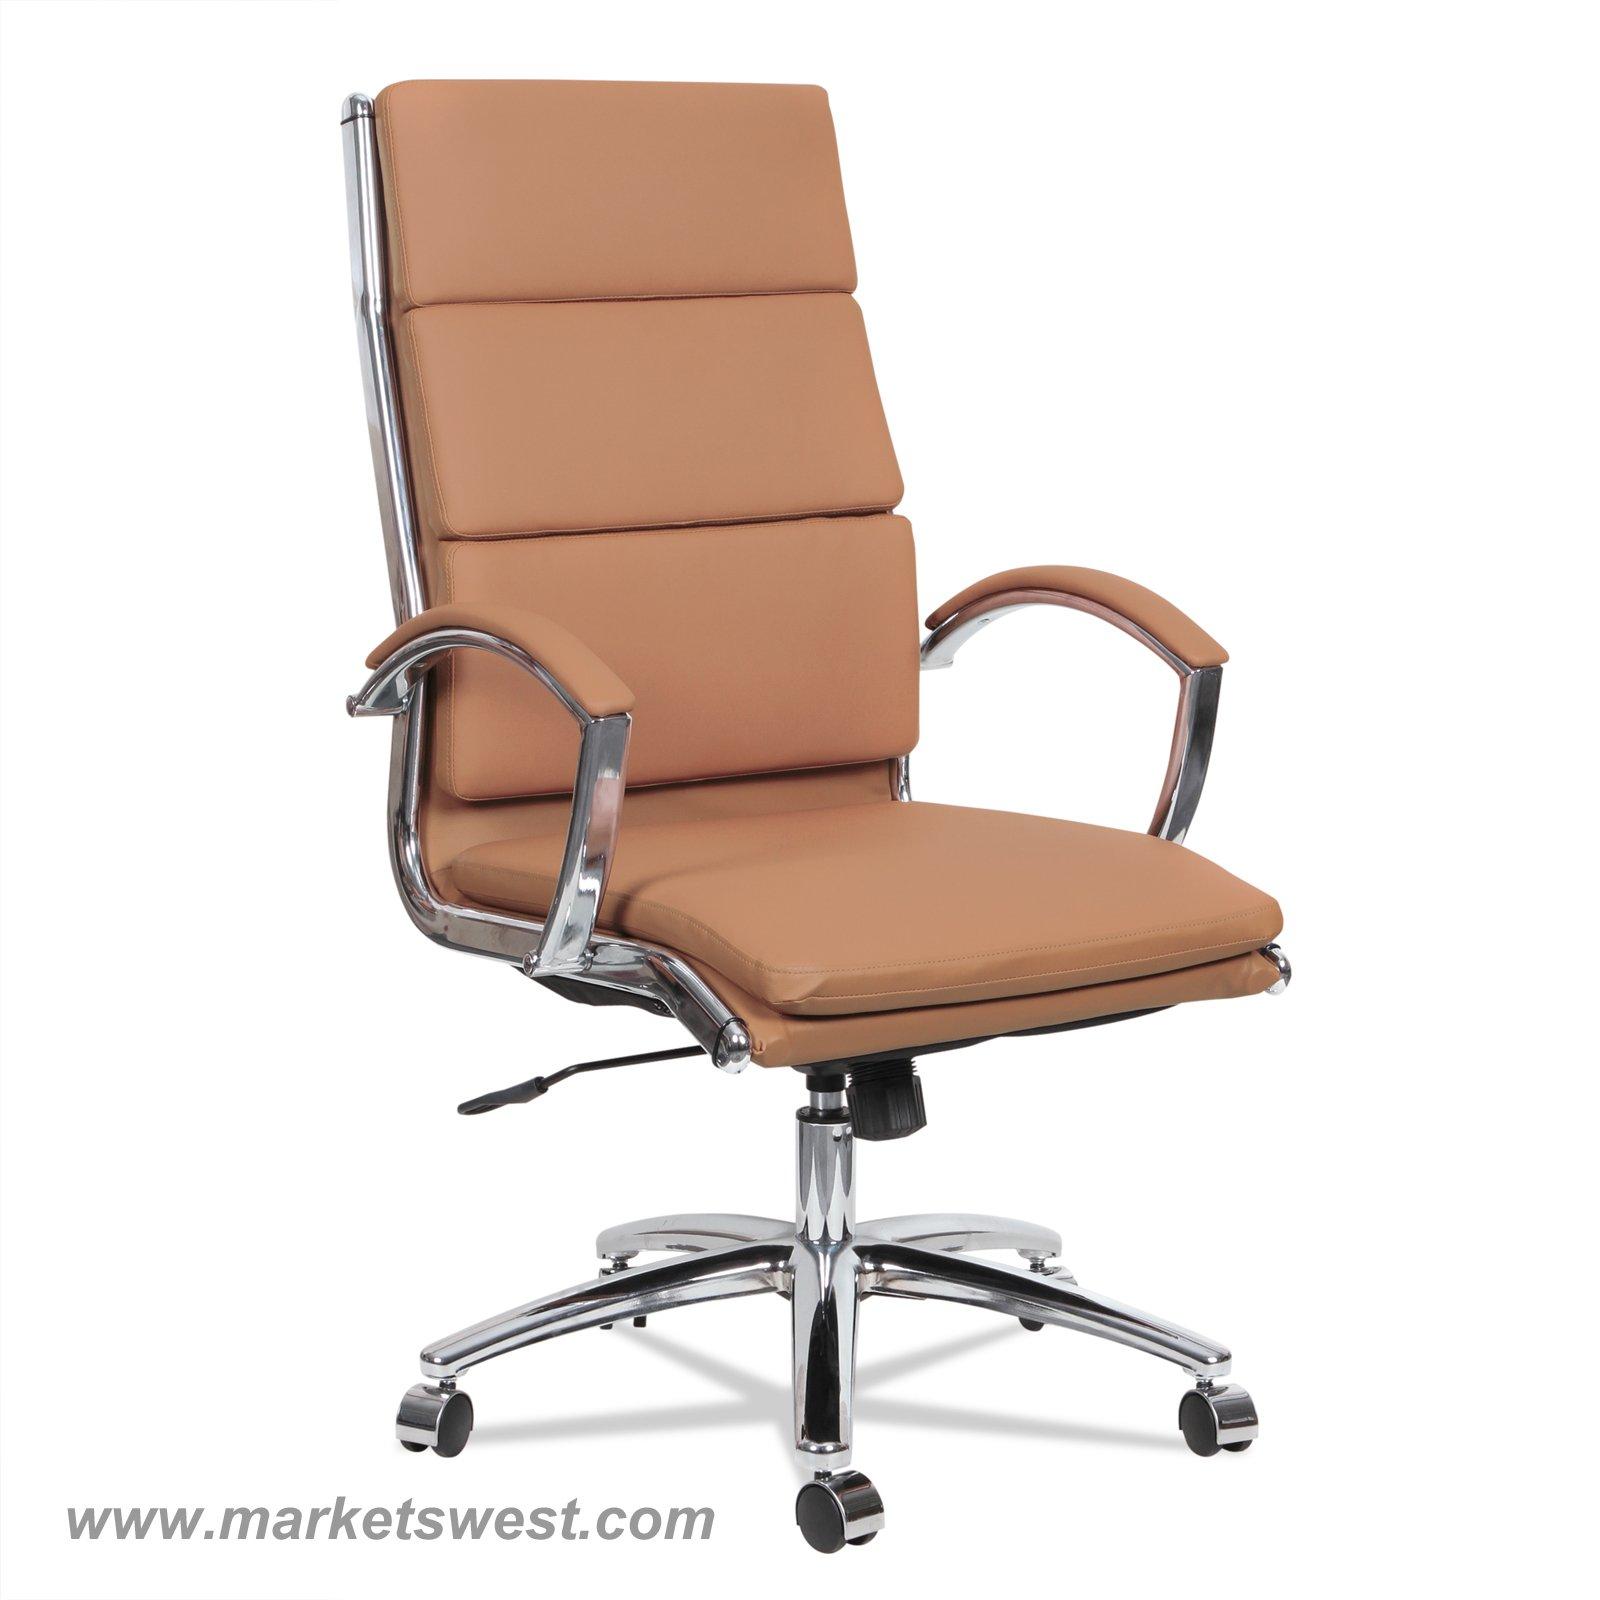 Neratoli High Back Swivel Tilt Chair Red Soft Touch Leather Chrome Frame